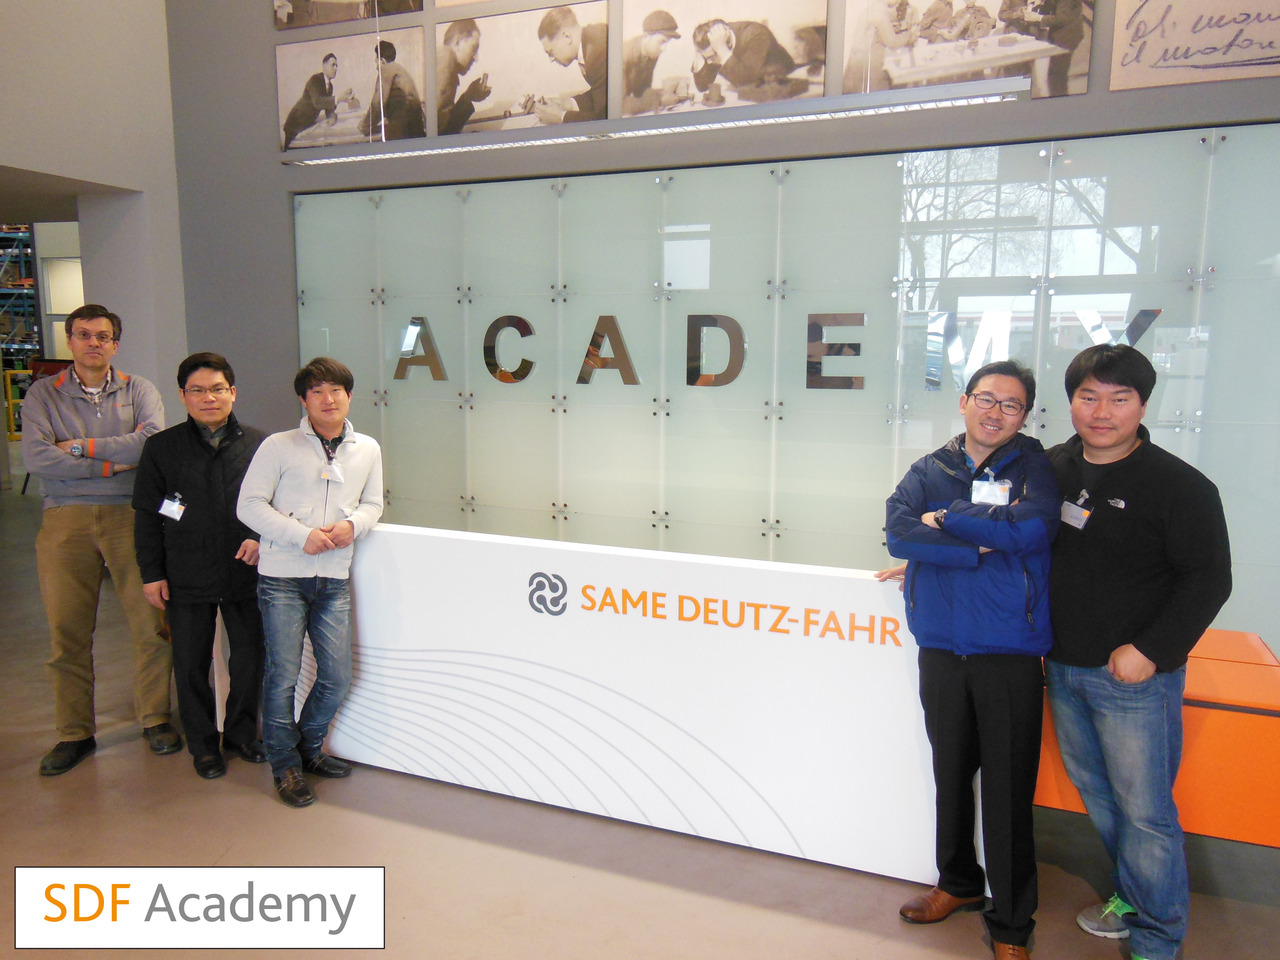 SDF Academy - Corso con tecnici sudcoreani